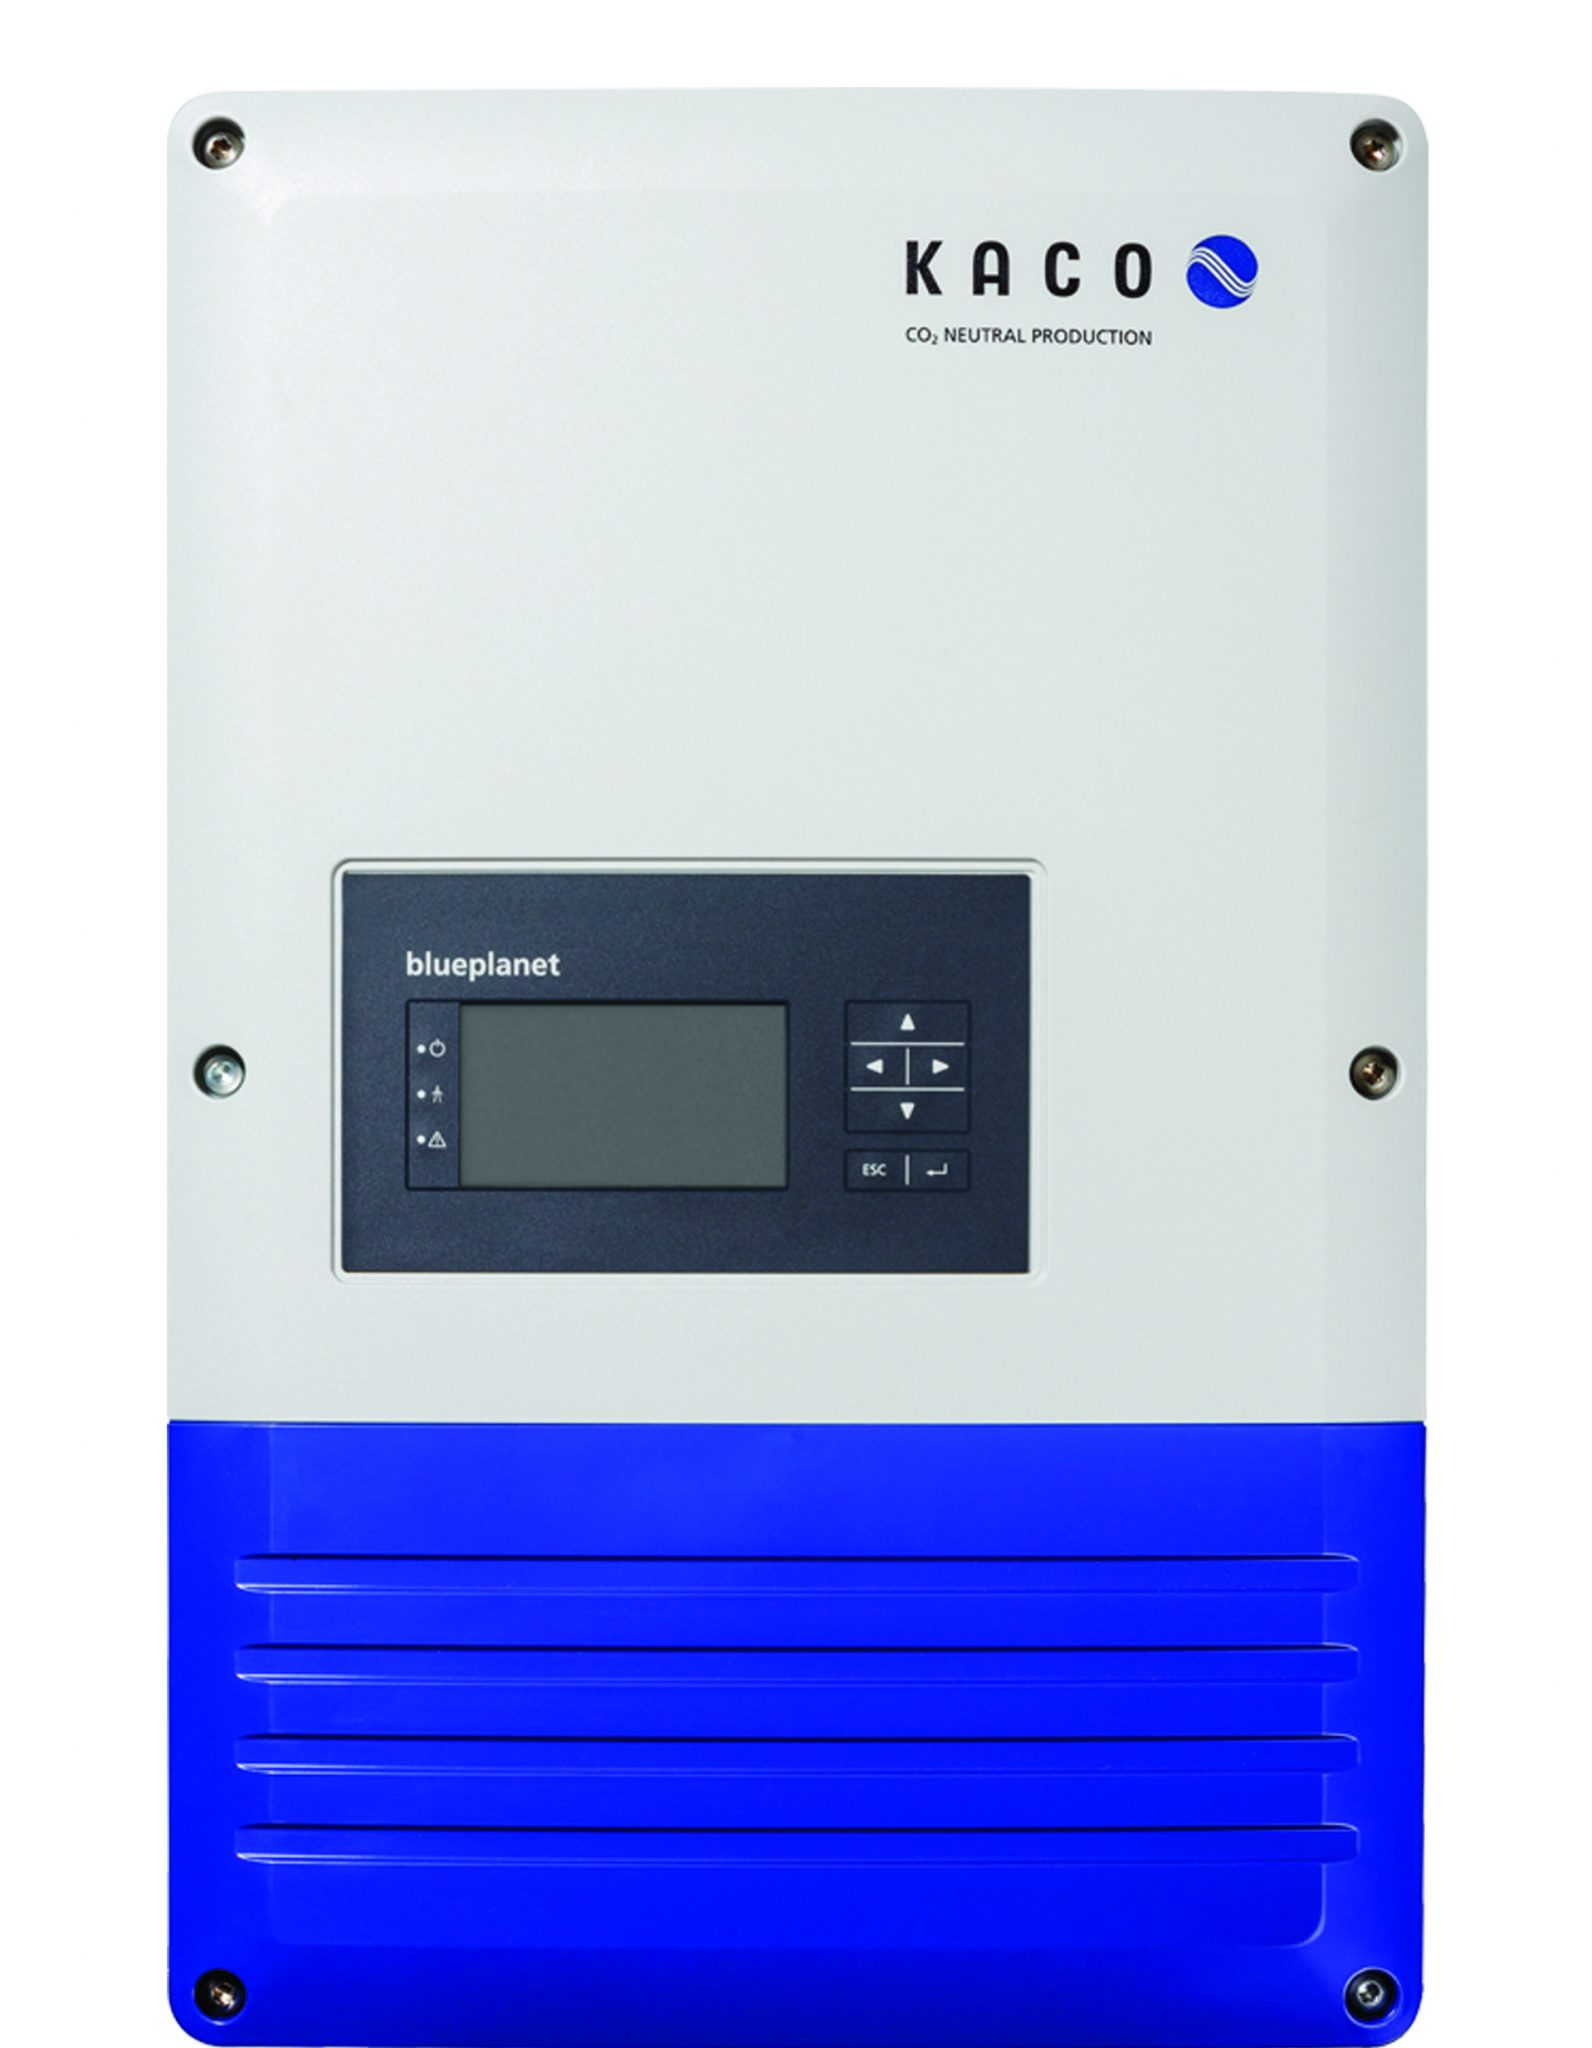 Kaco-Blueplanet-5.0